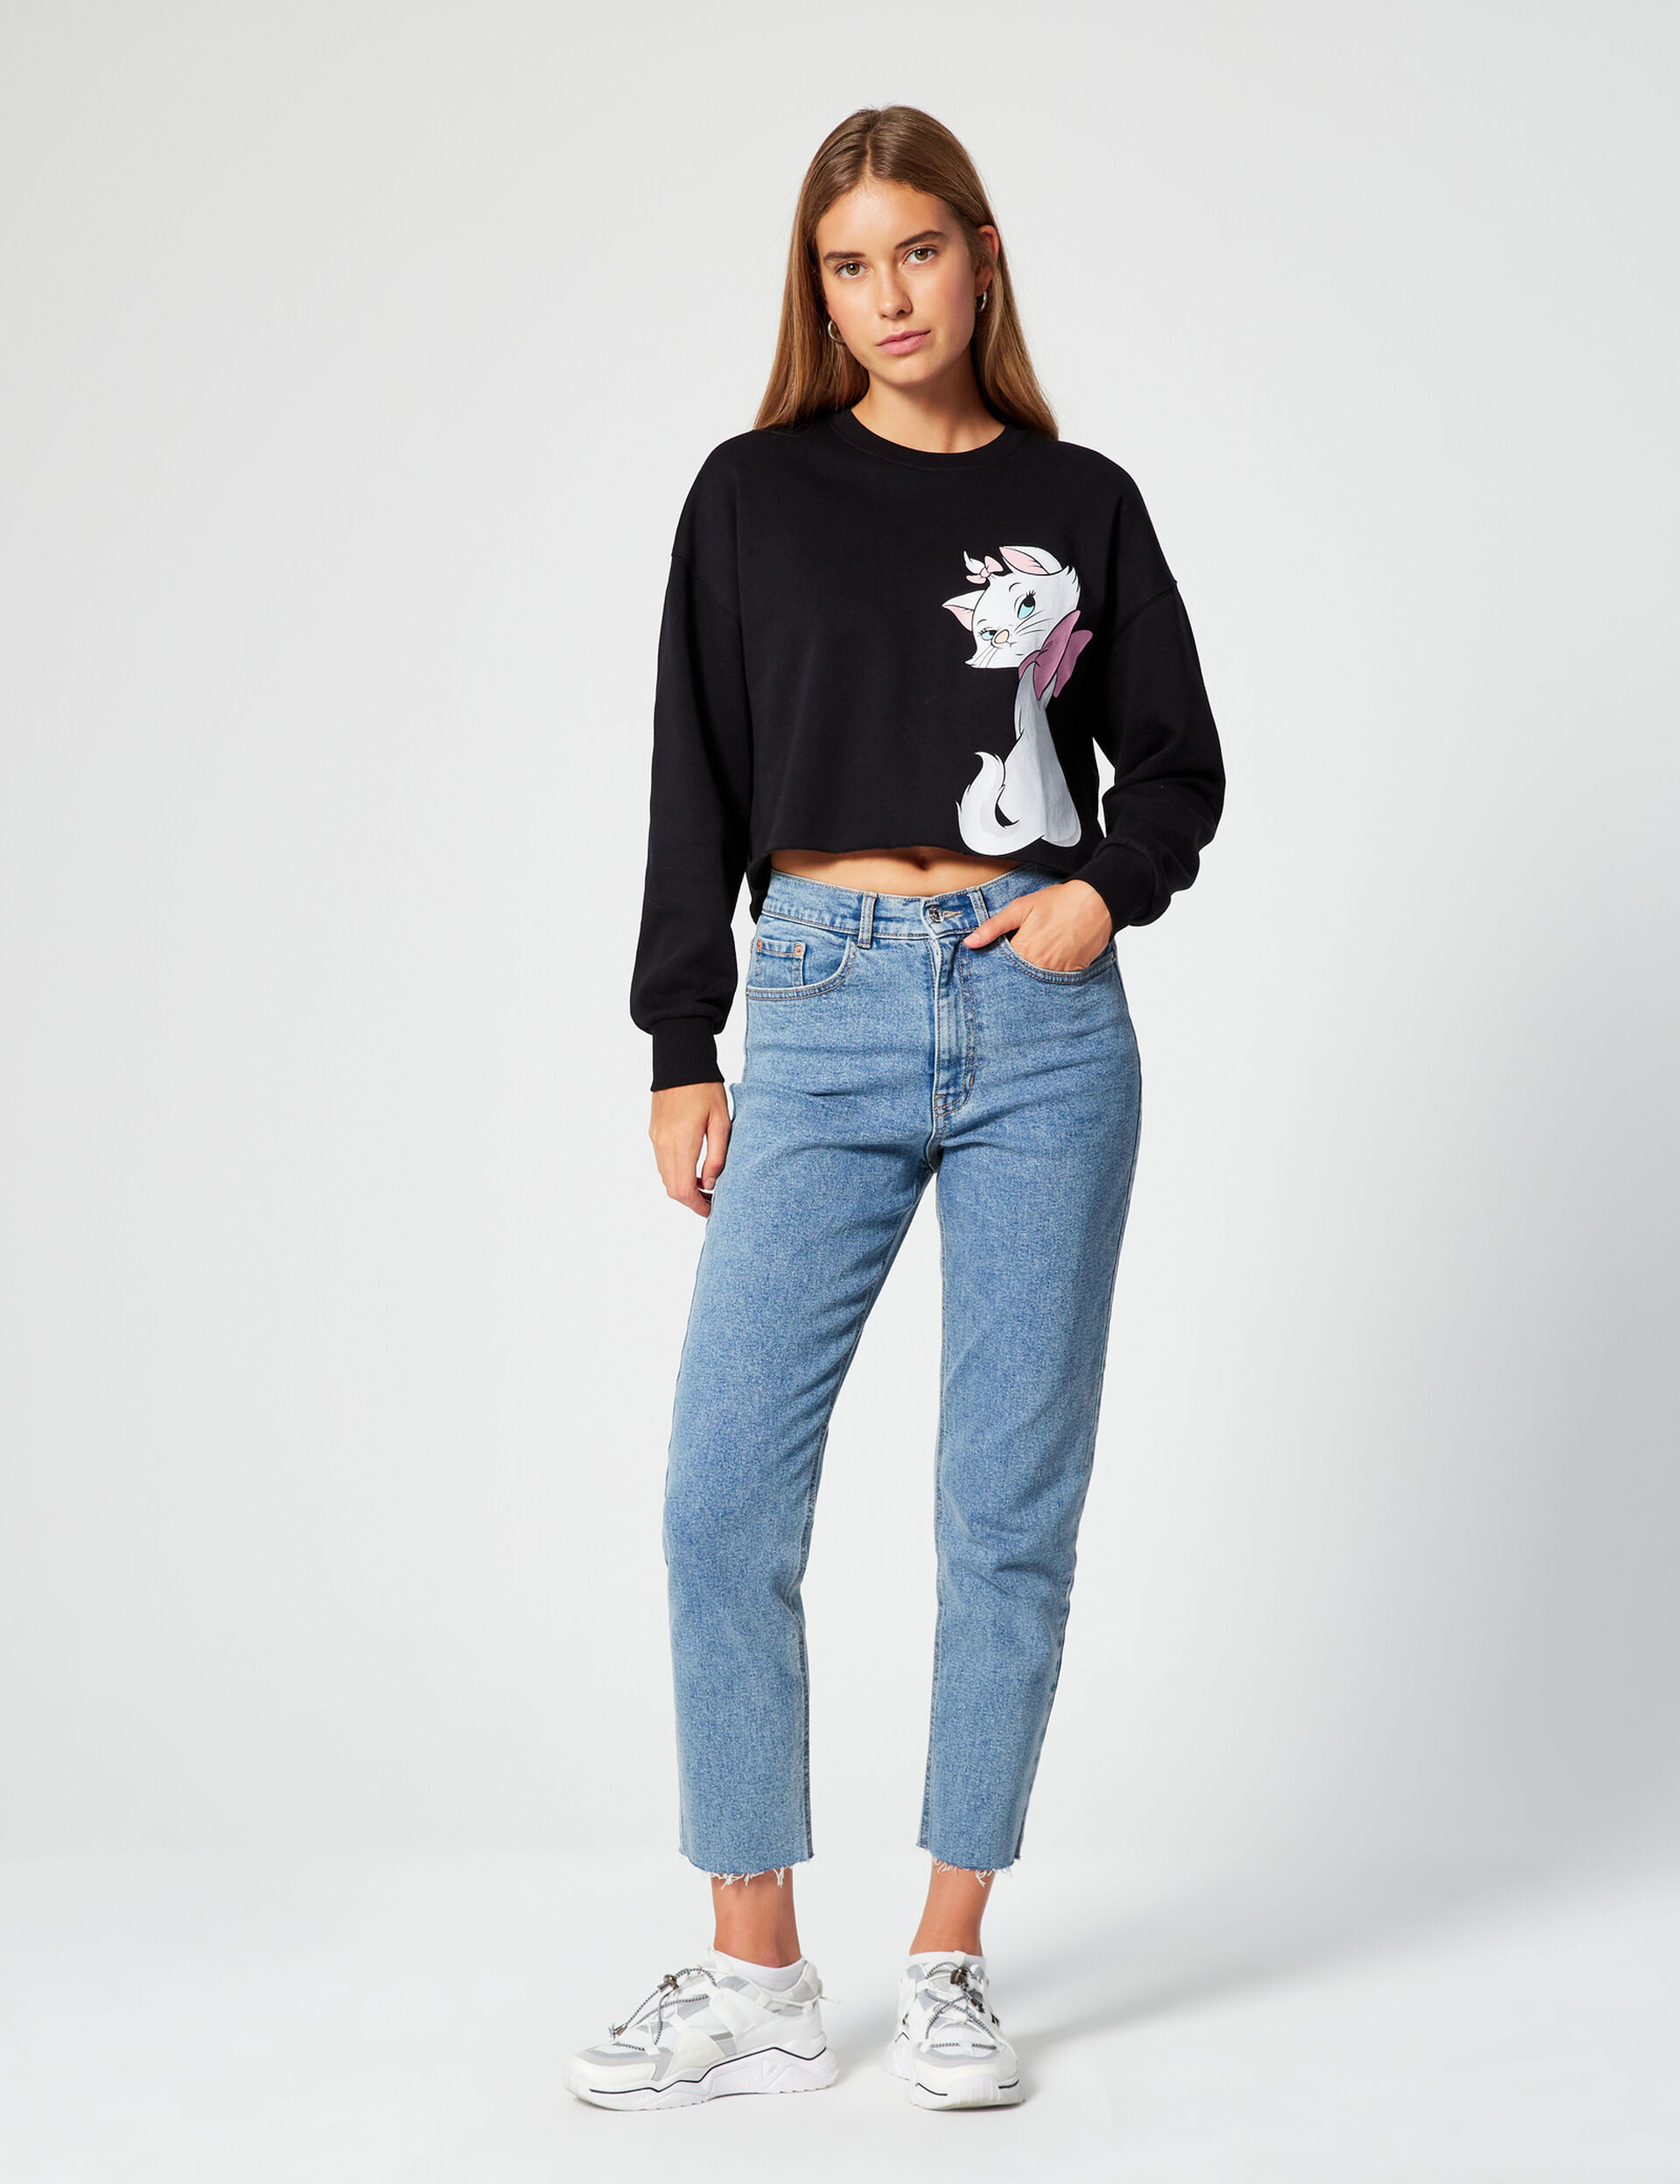 Disney Aristocats sweatshirt